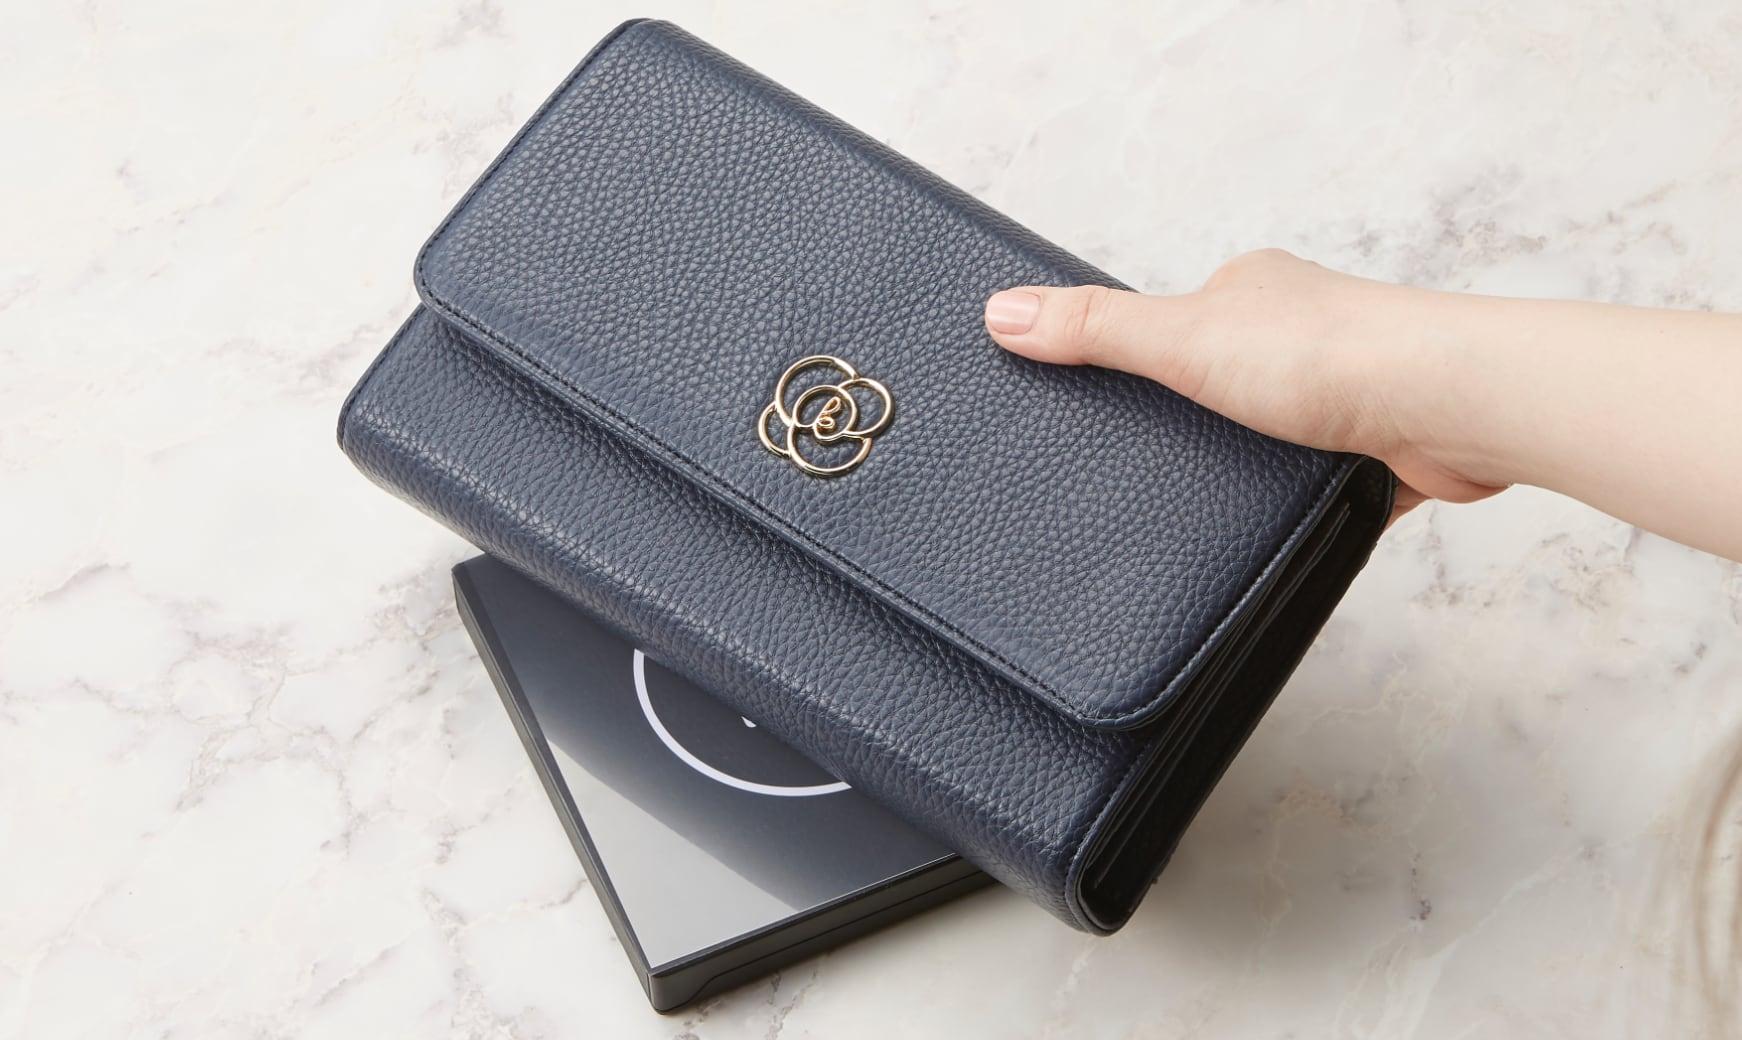 29_Pocket_Wallet_Bag_IC_Card.jpg